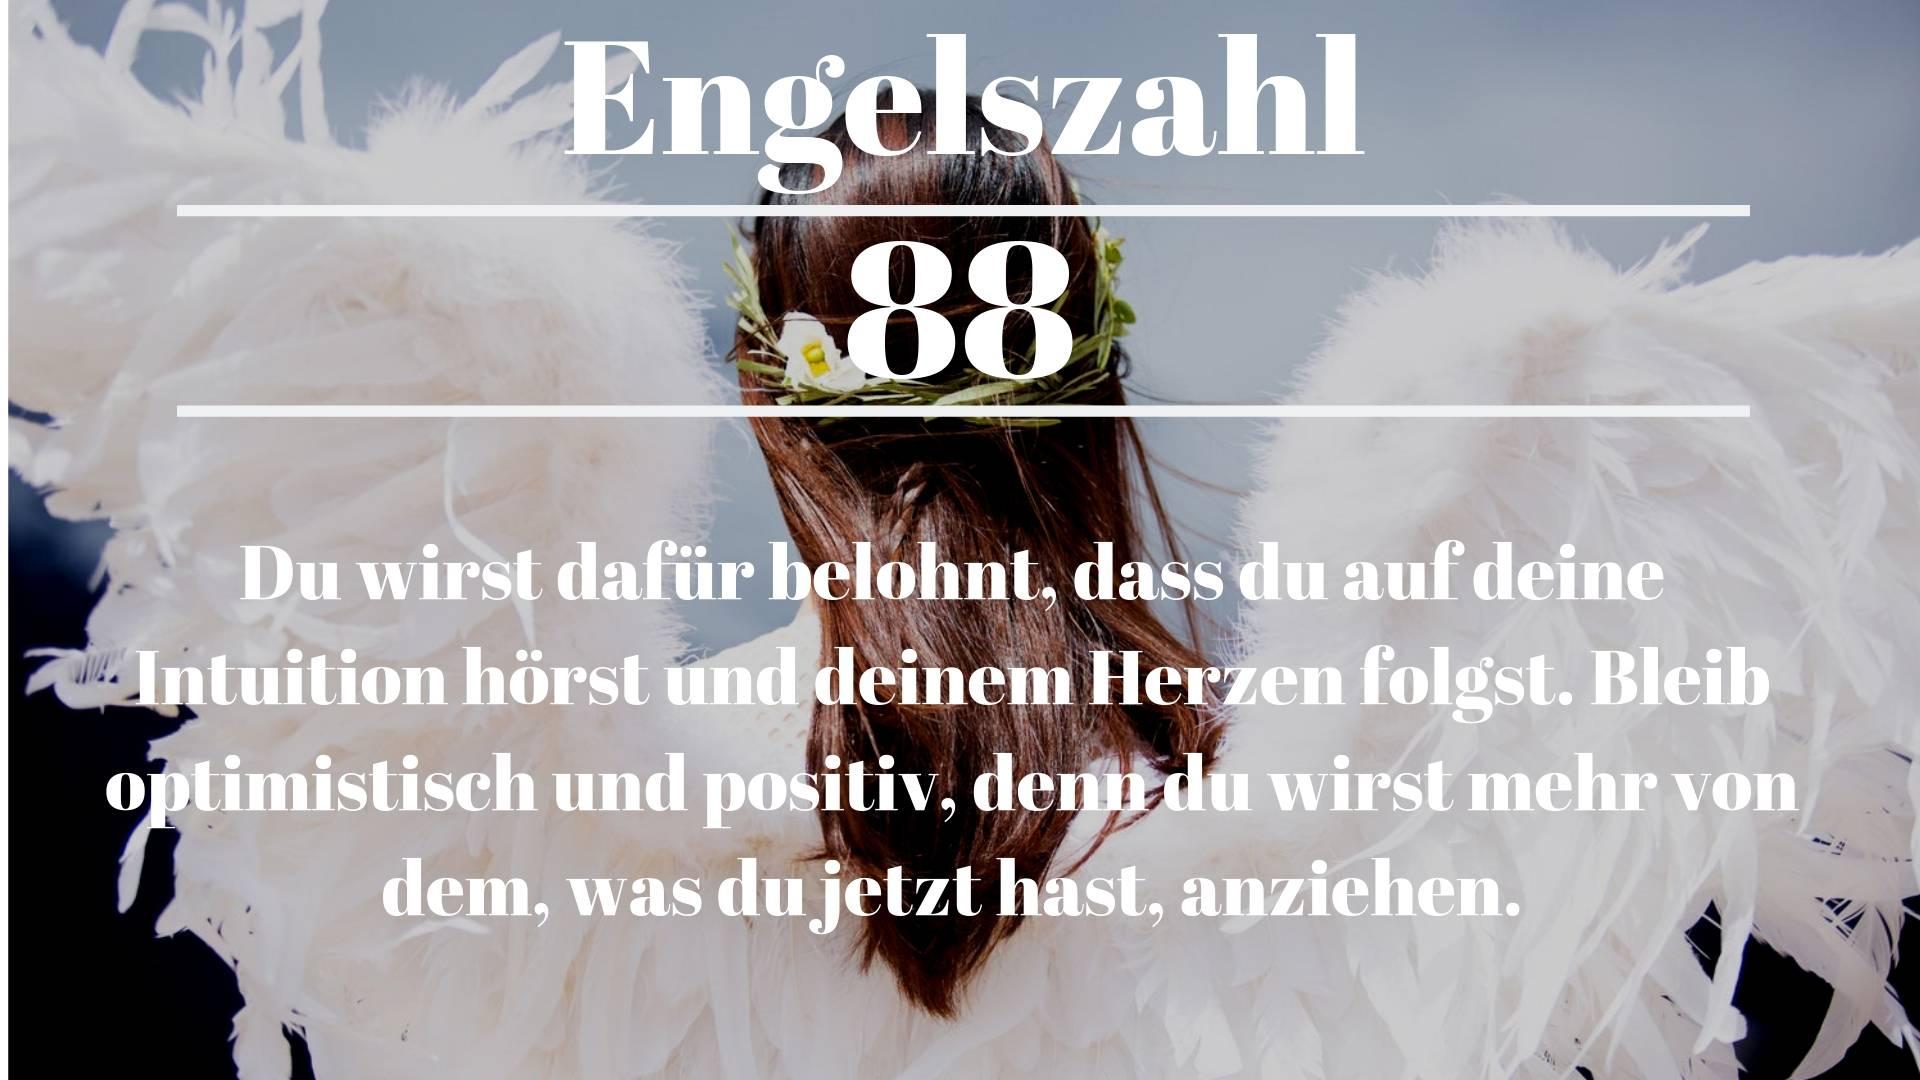 Egal Is 88